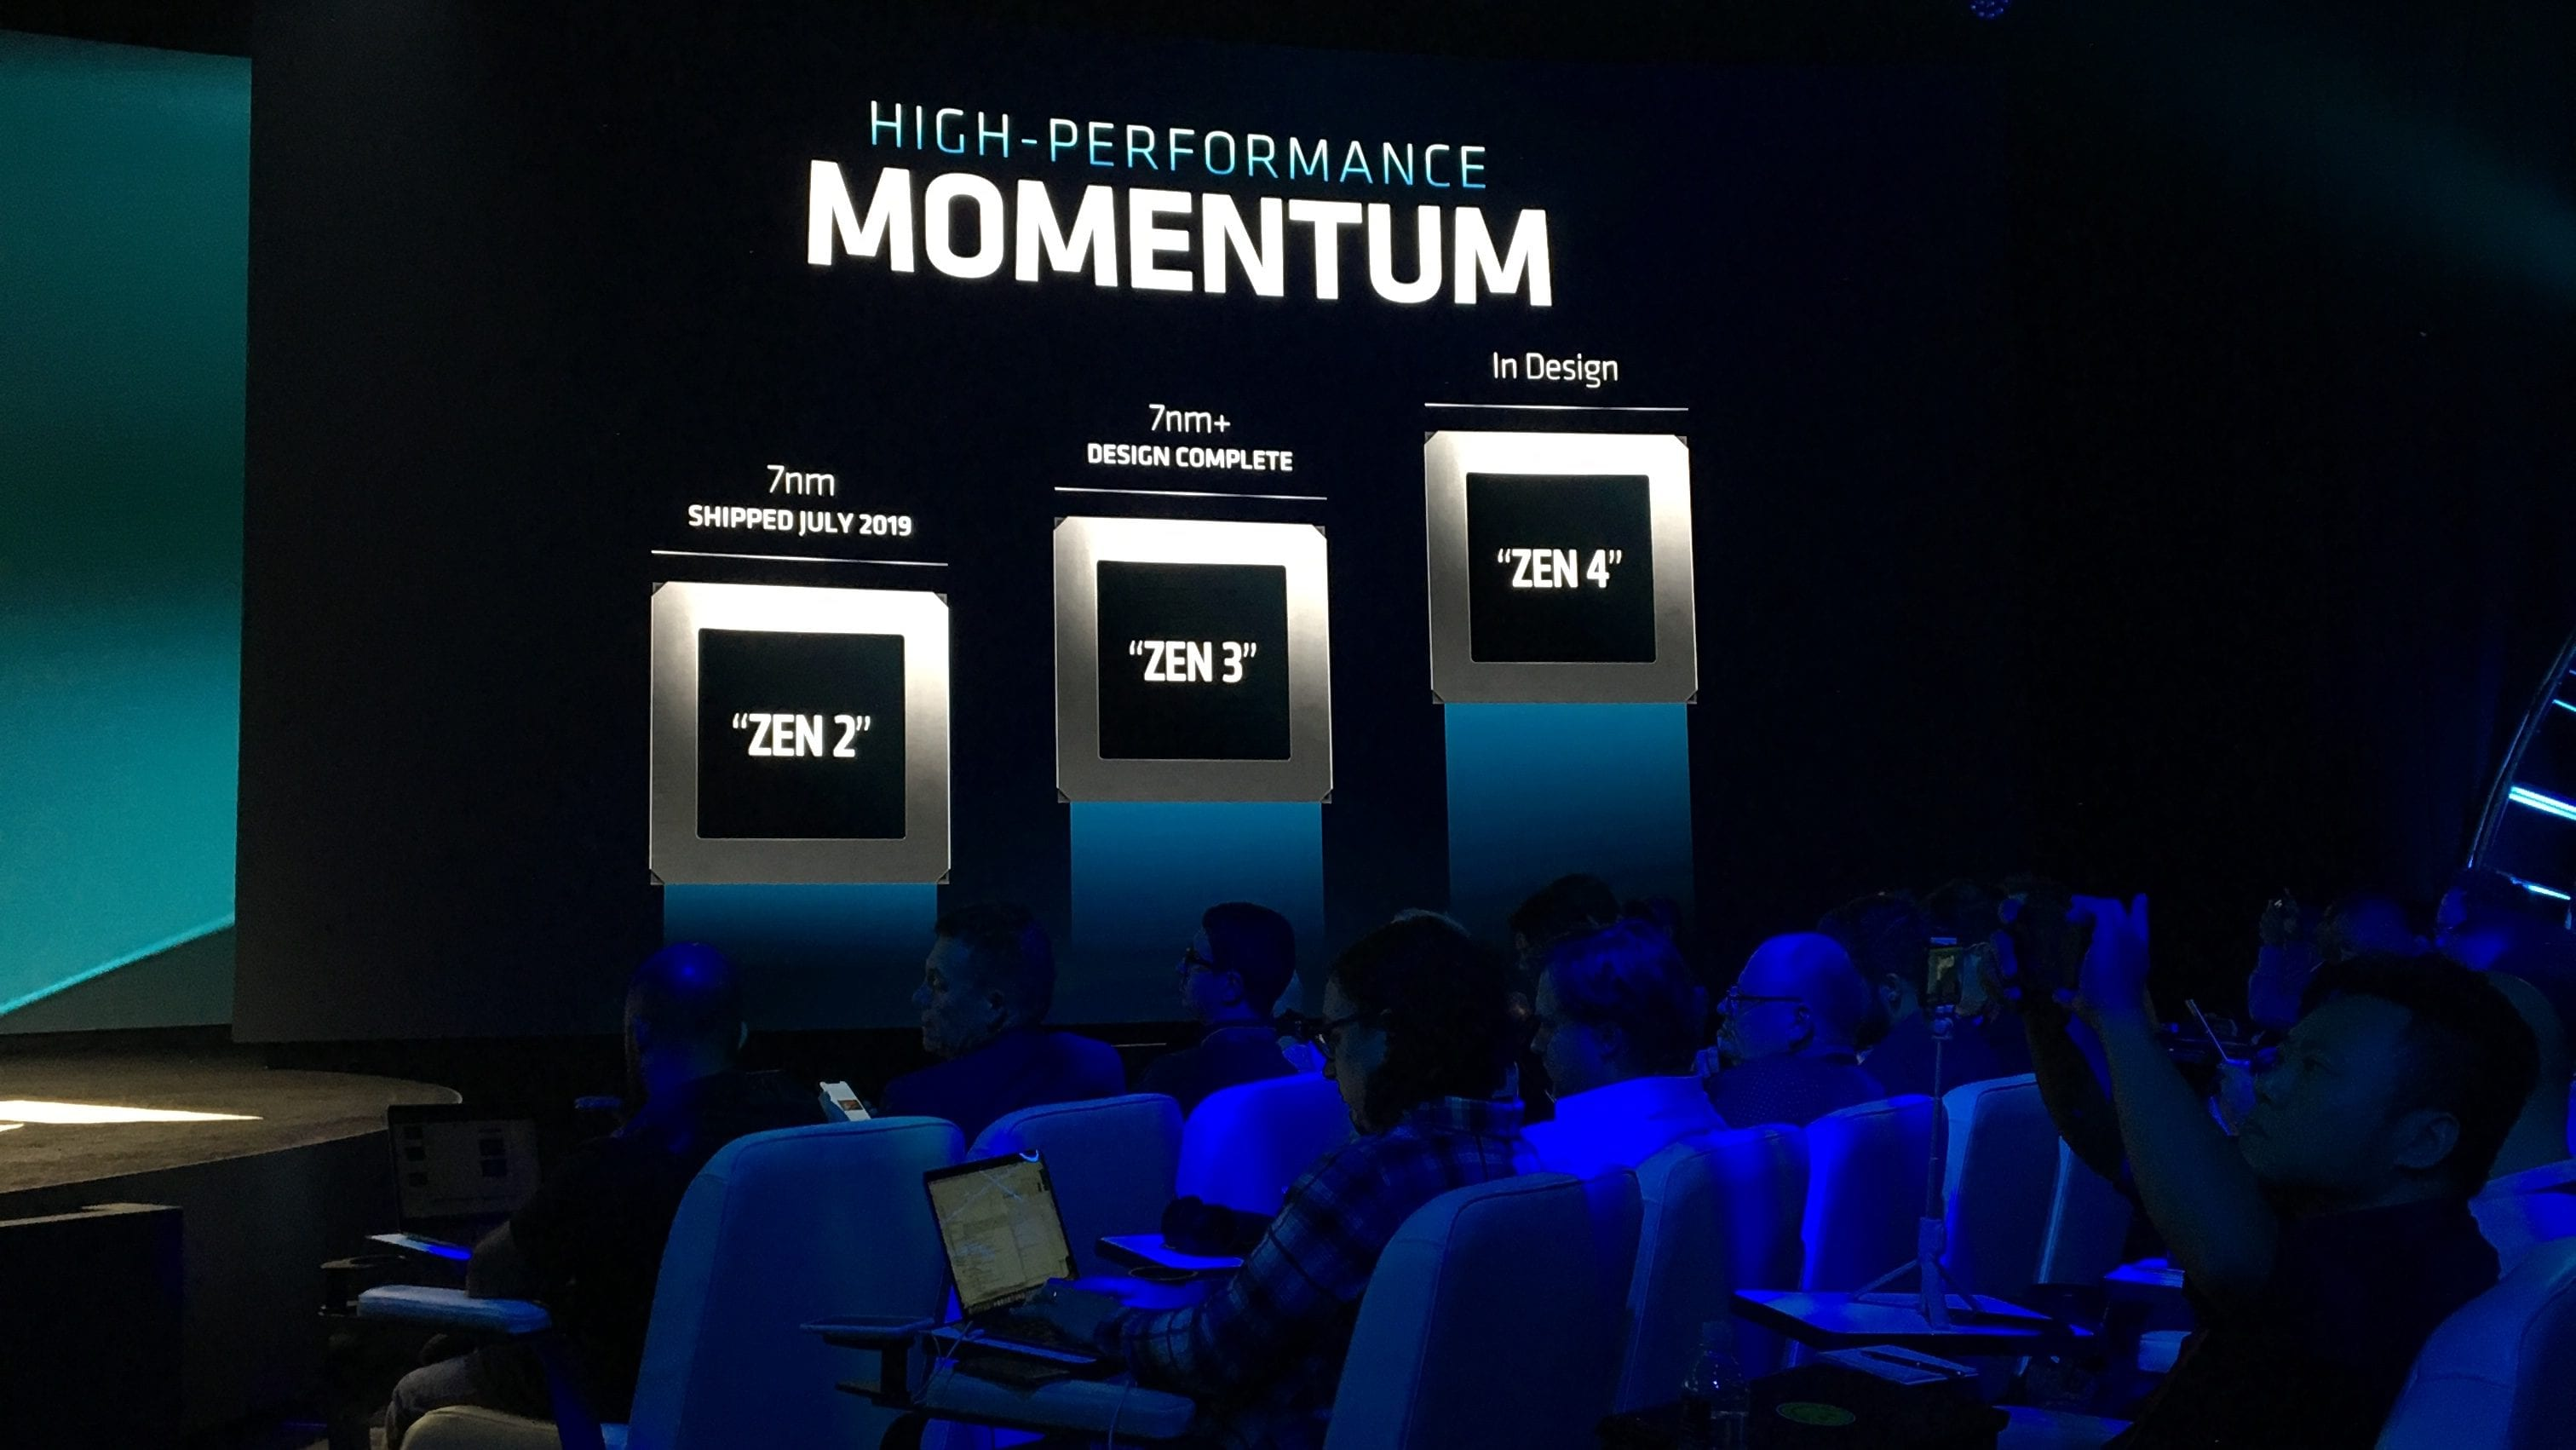 Core i9 9900K на частоте 7000МГц: OGS поставил рекорд Geekbench3 в модельном зачете процессора